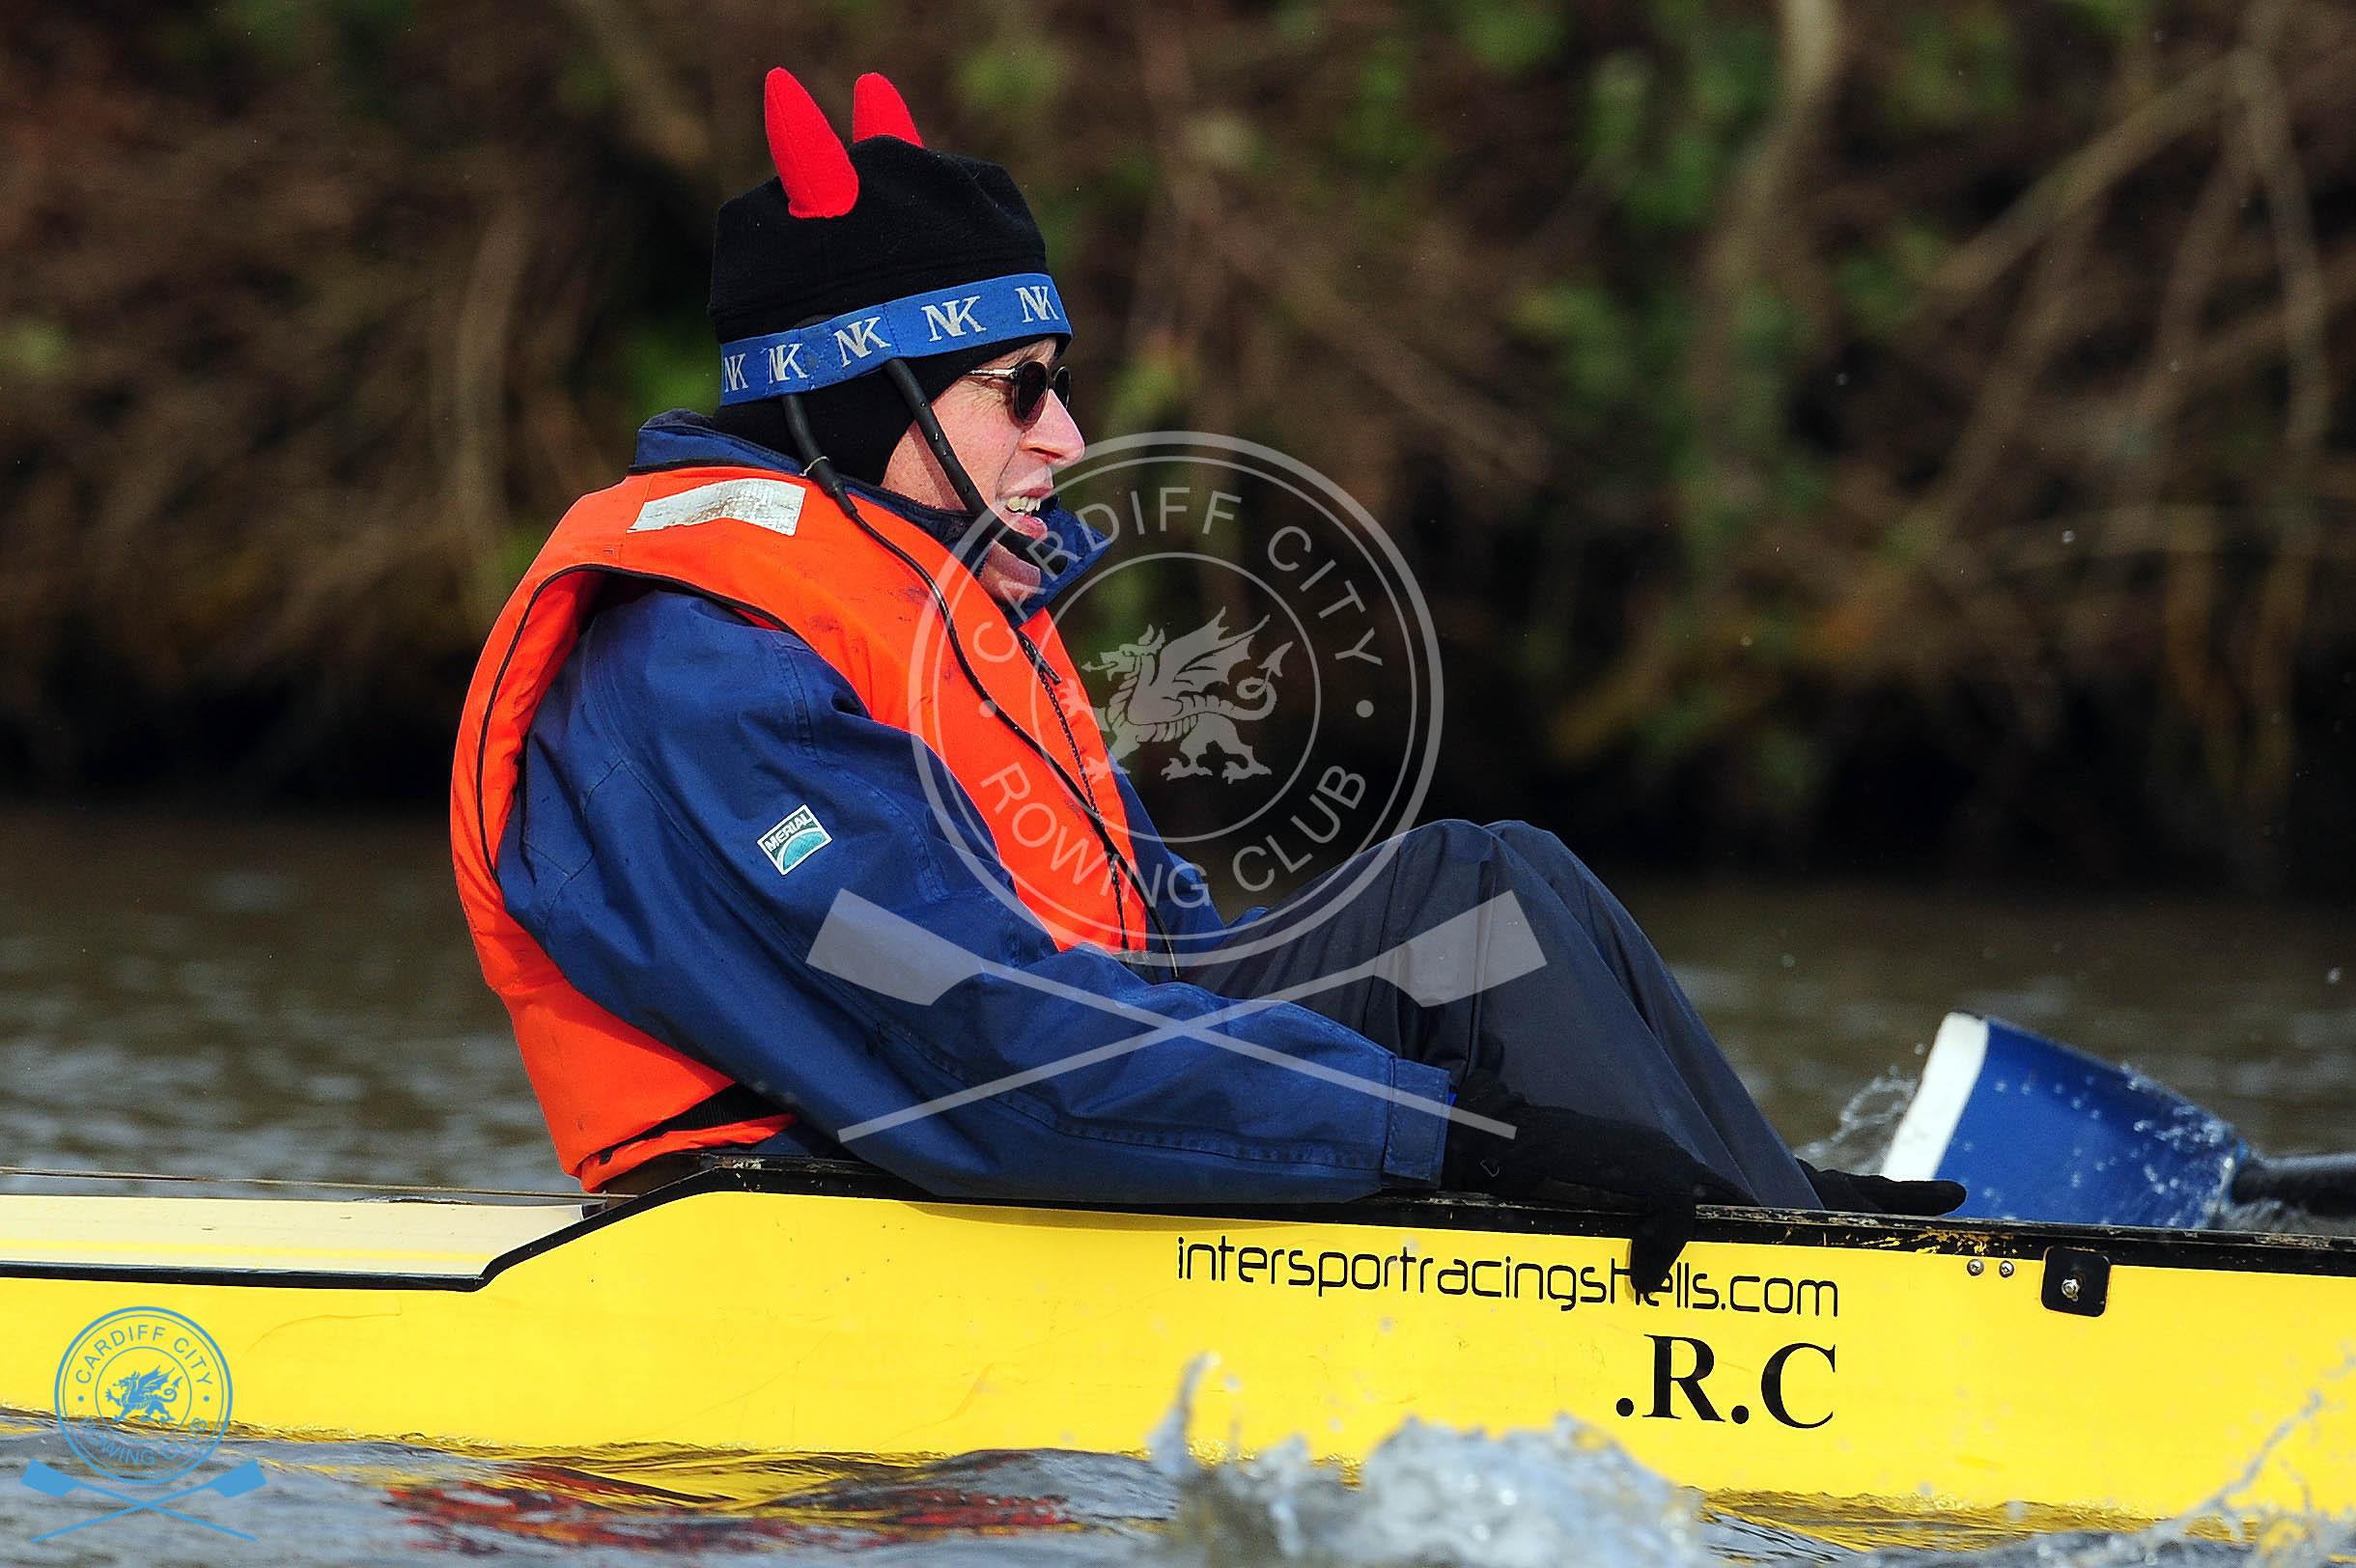 DW_280119_Cardiff_City_Rowing_268.jpg